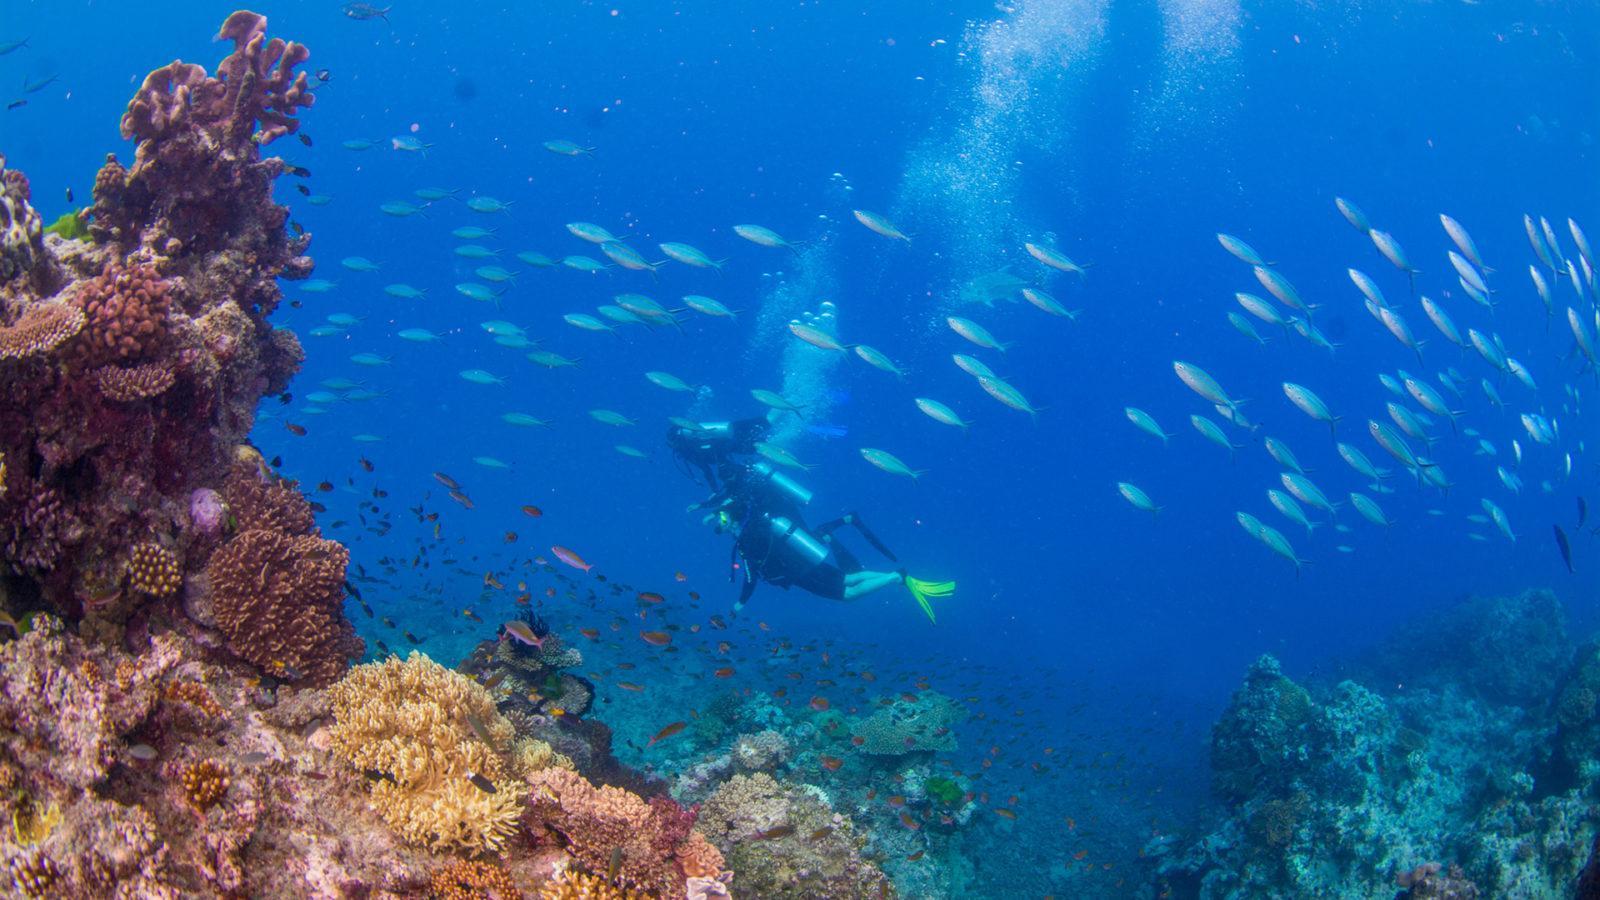 Scuba Diving Expedition by Divers Den